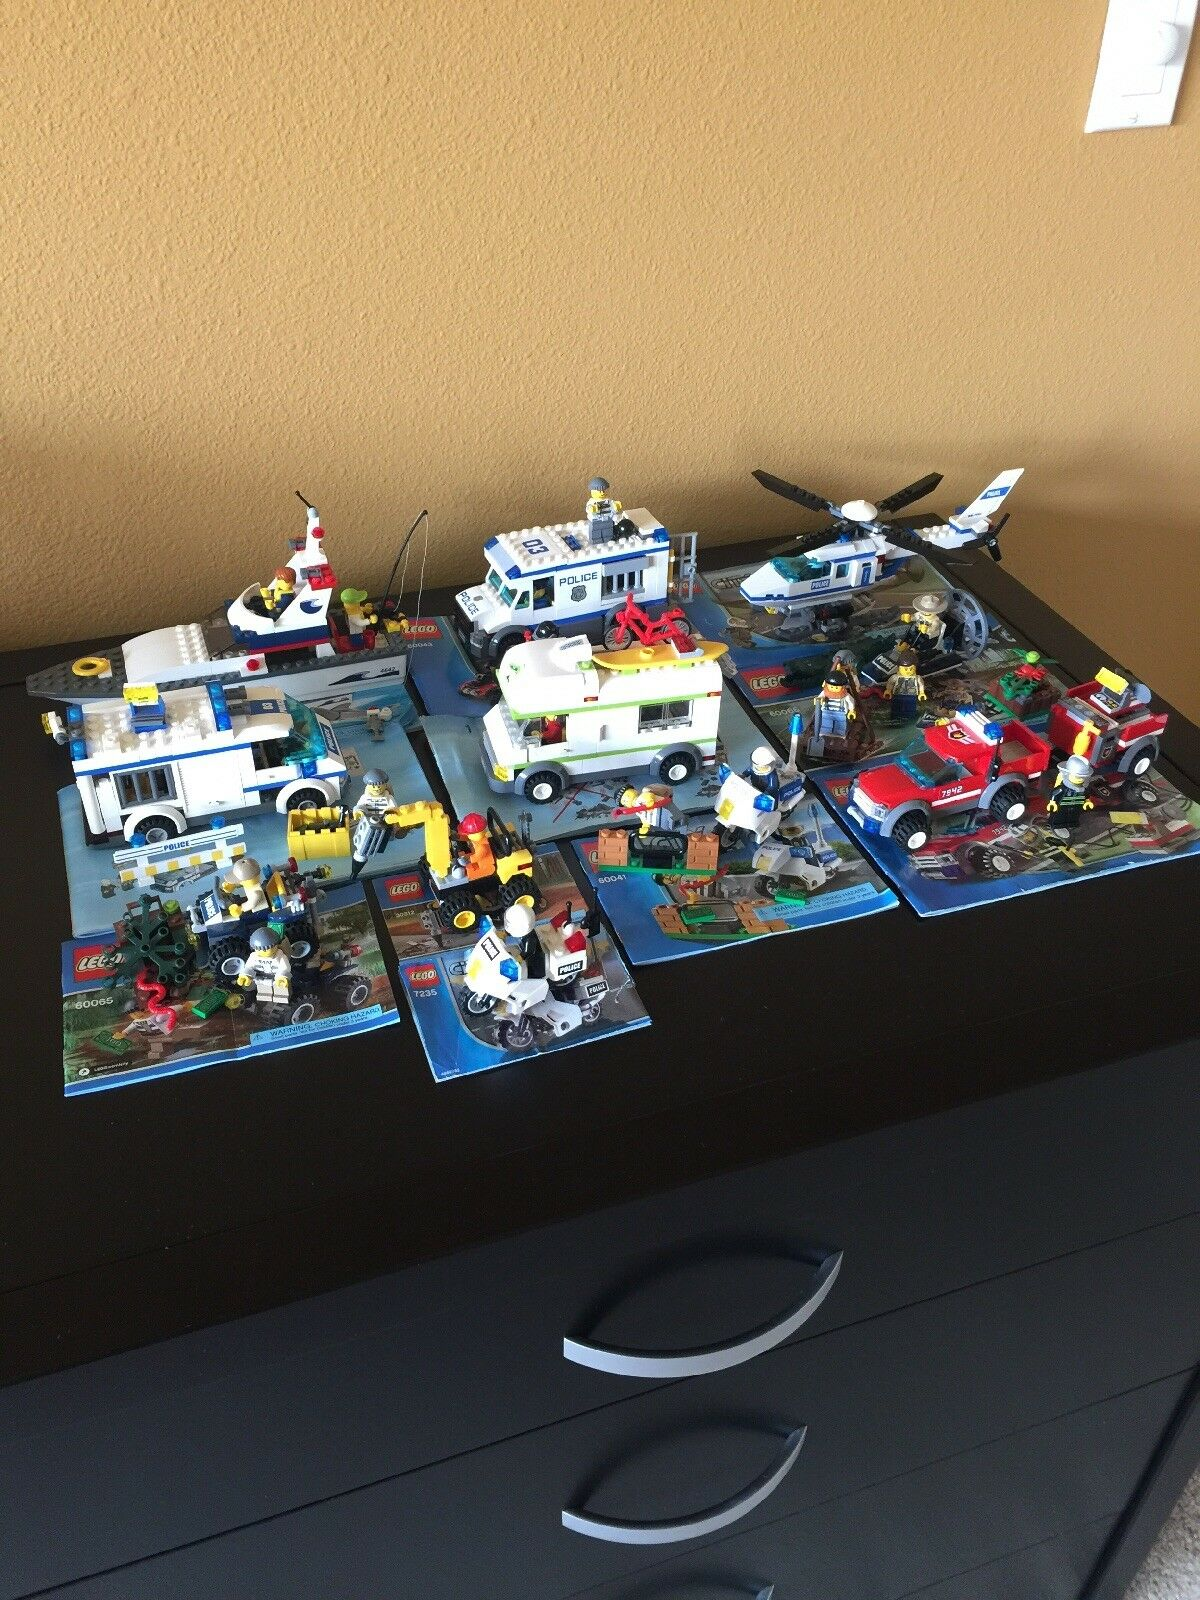 LEGO stad 4642, 6043, 7741, 6066, 7942, 6041, 30312, 6065, 7639, 7235, 7286